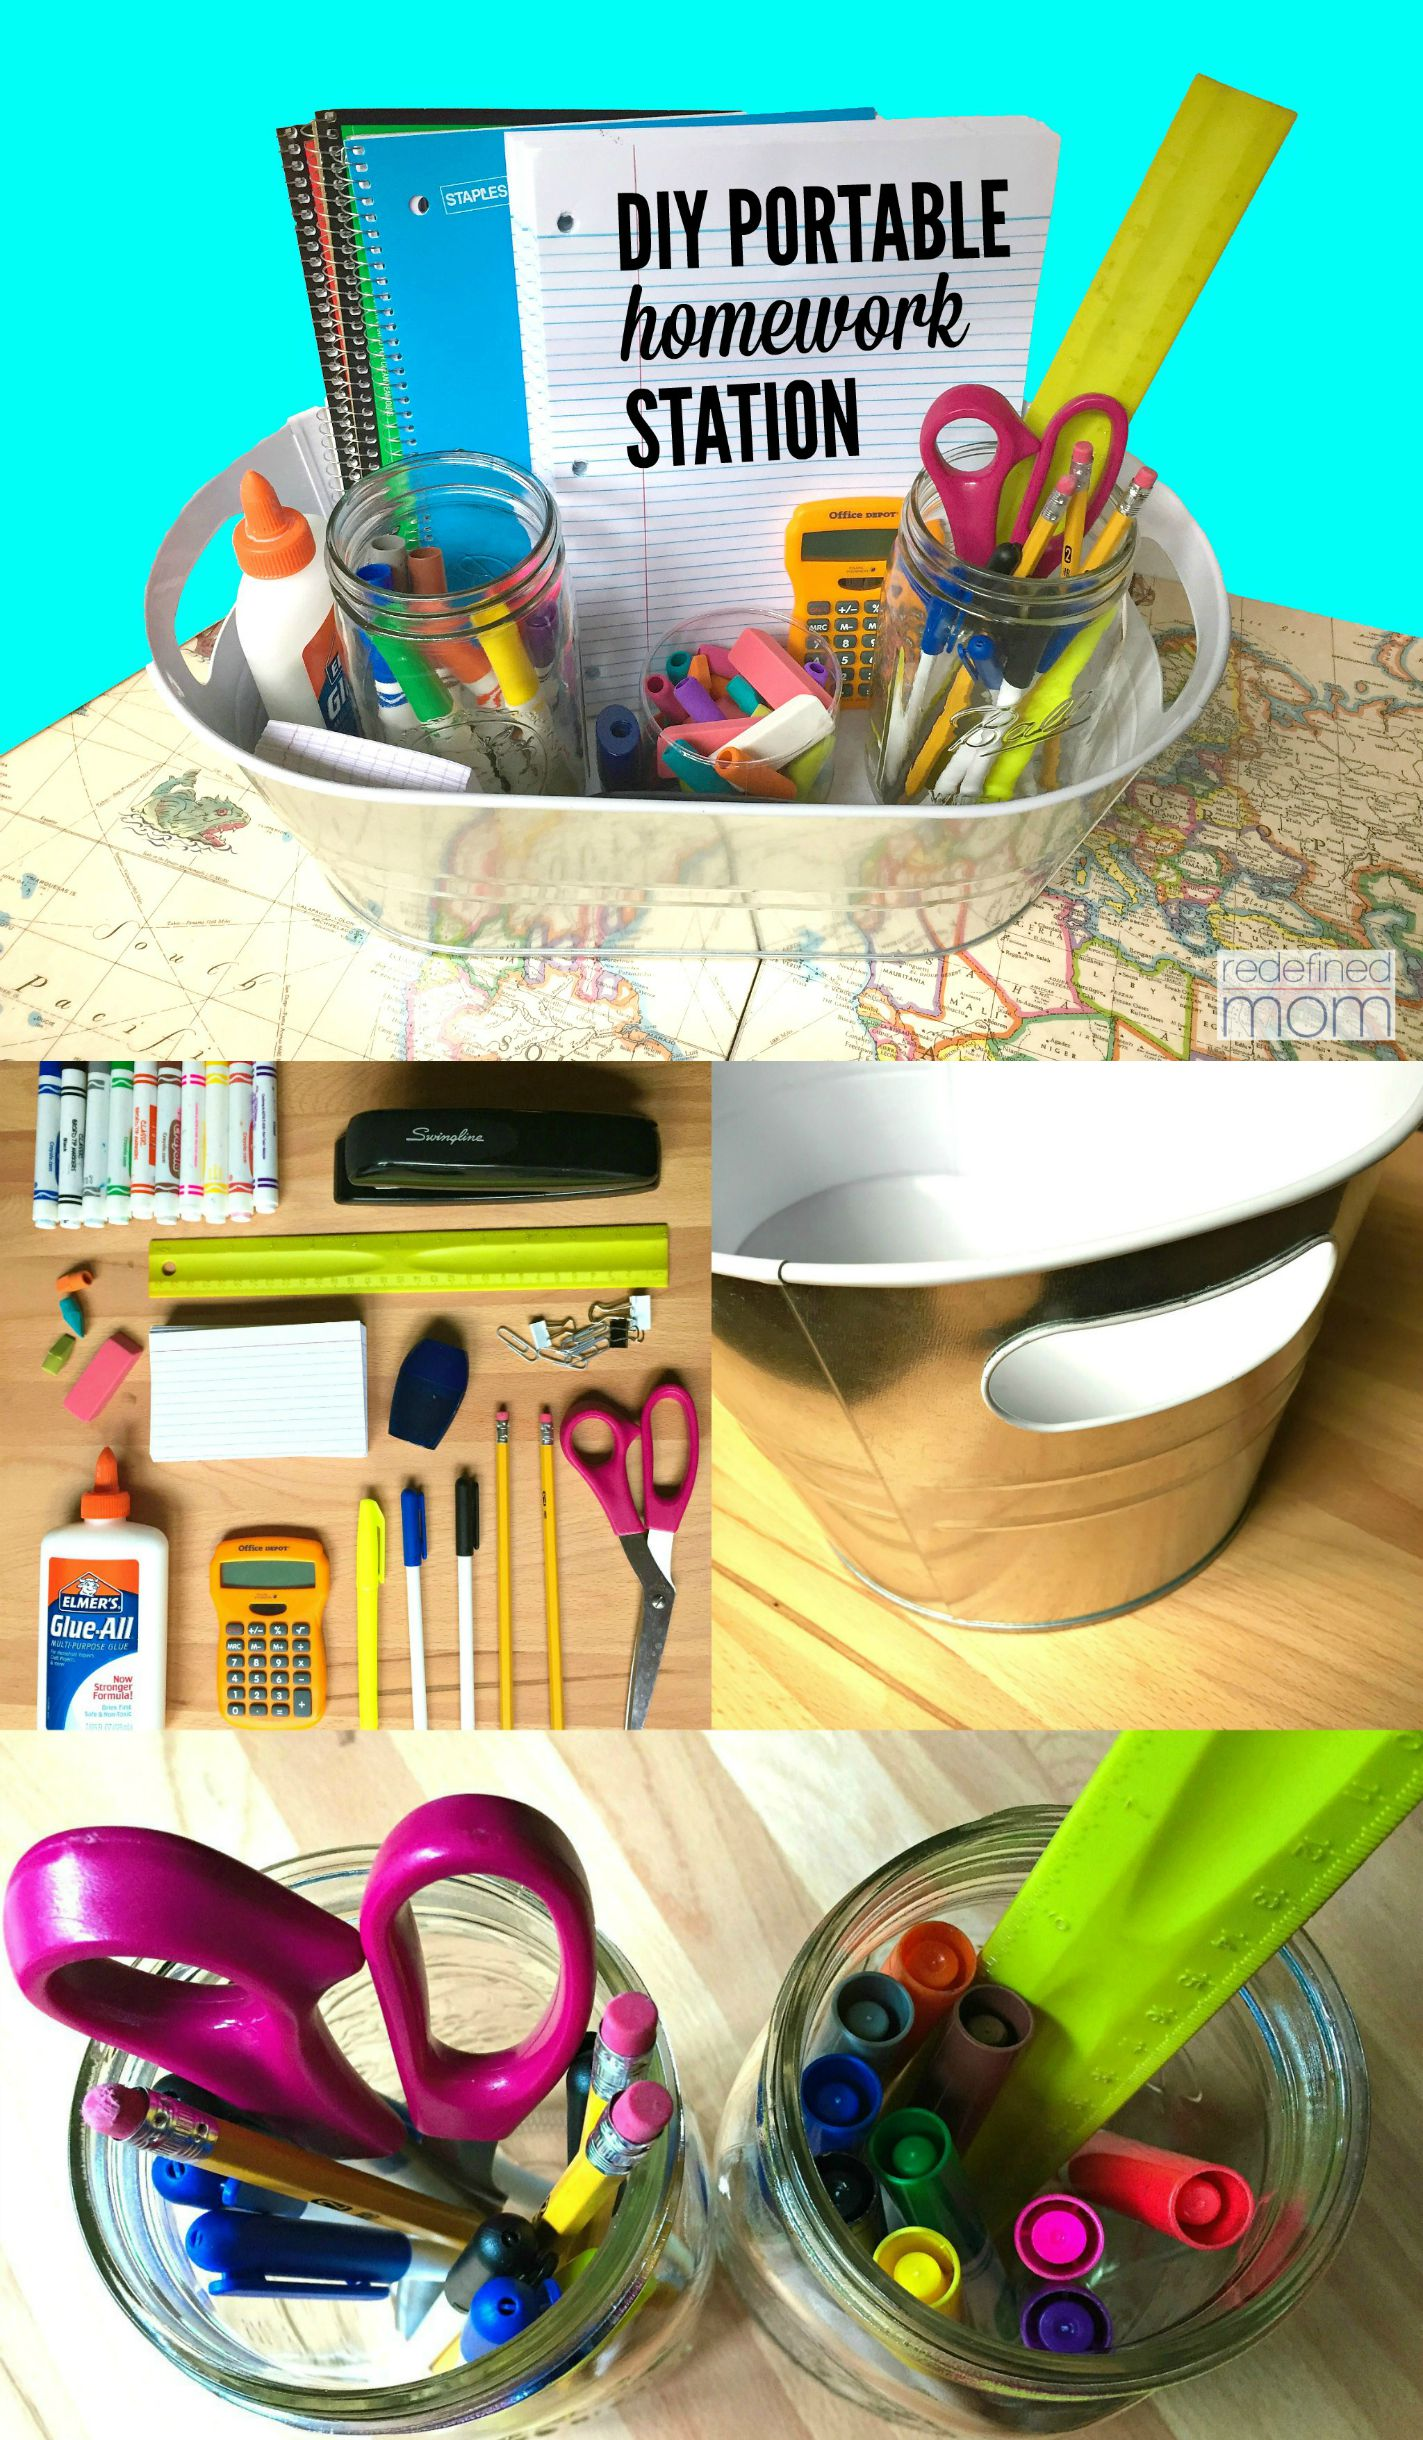 DIY Portable Homework Station Collage